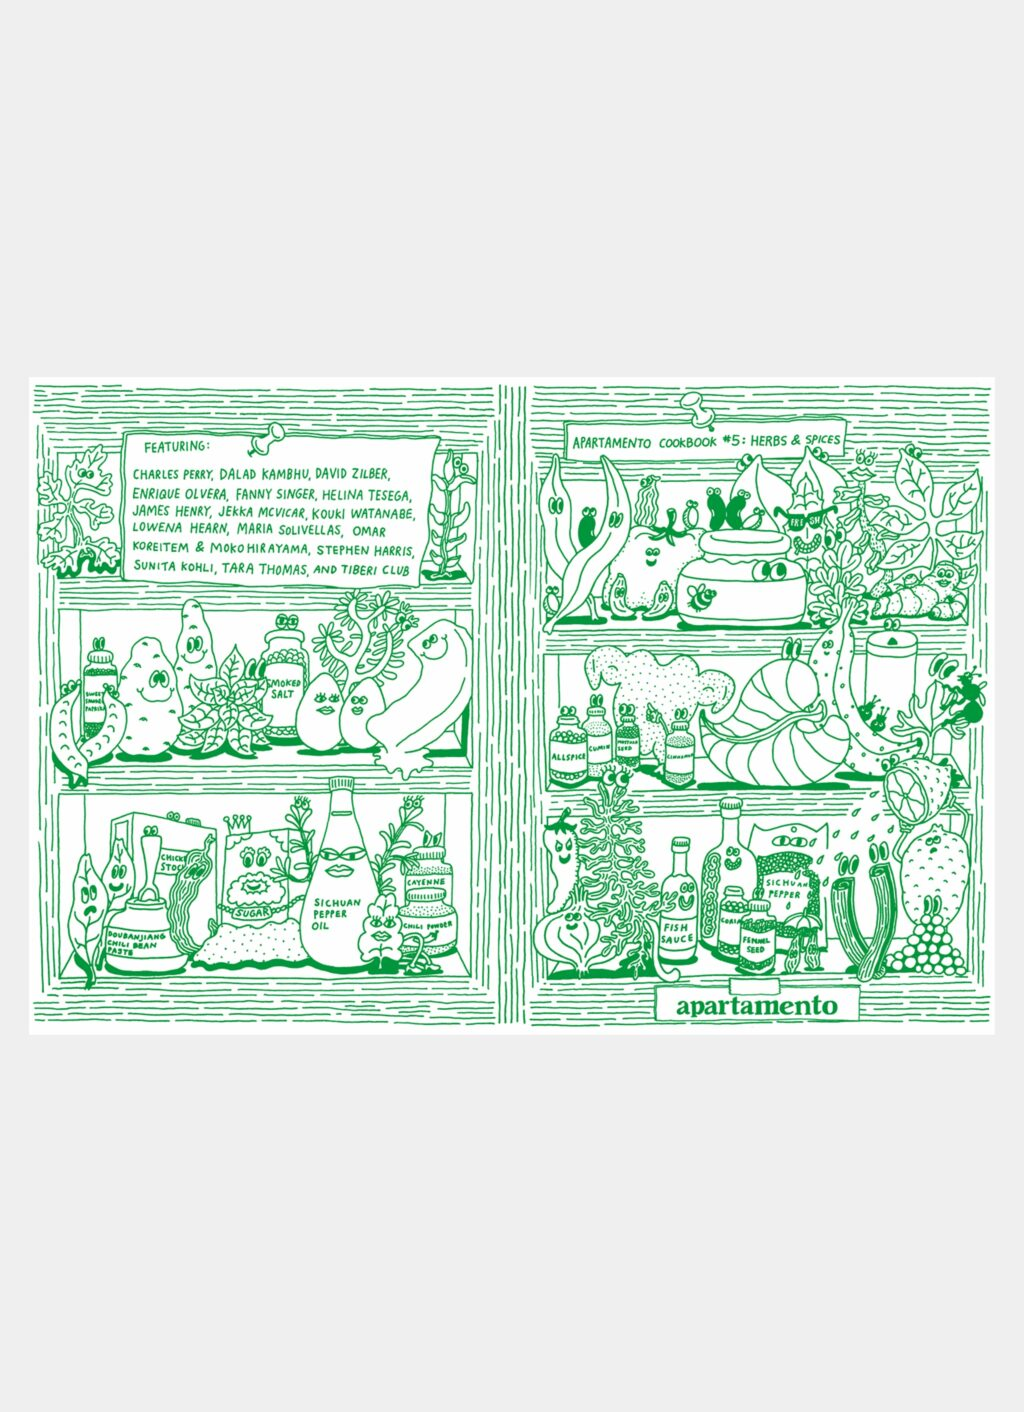 Apartamento - Cookbook #5 - Herbs and Spices